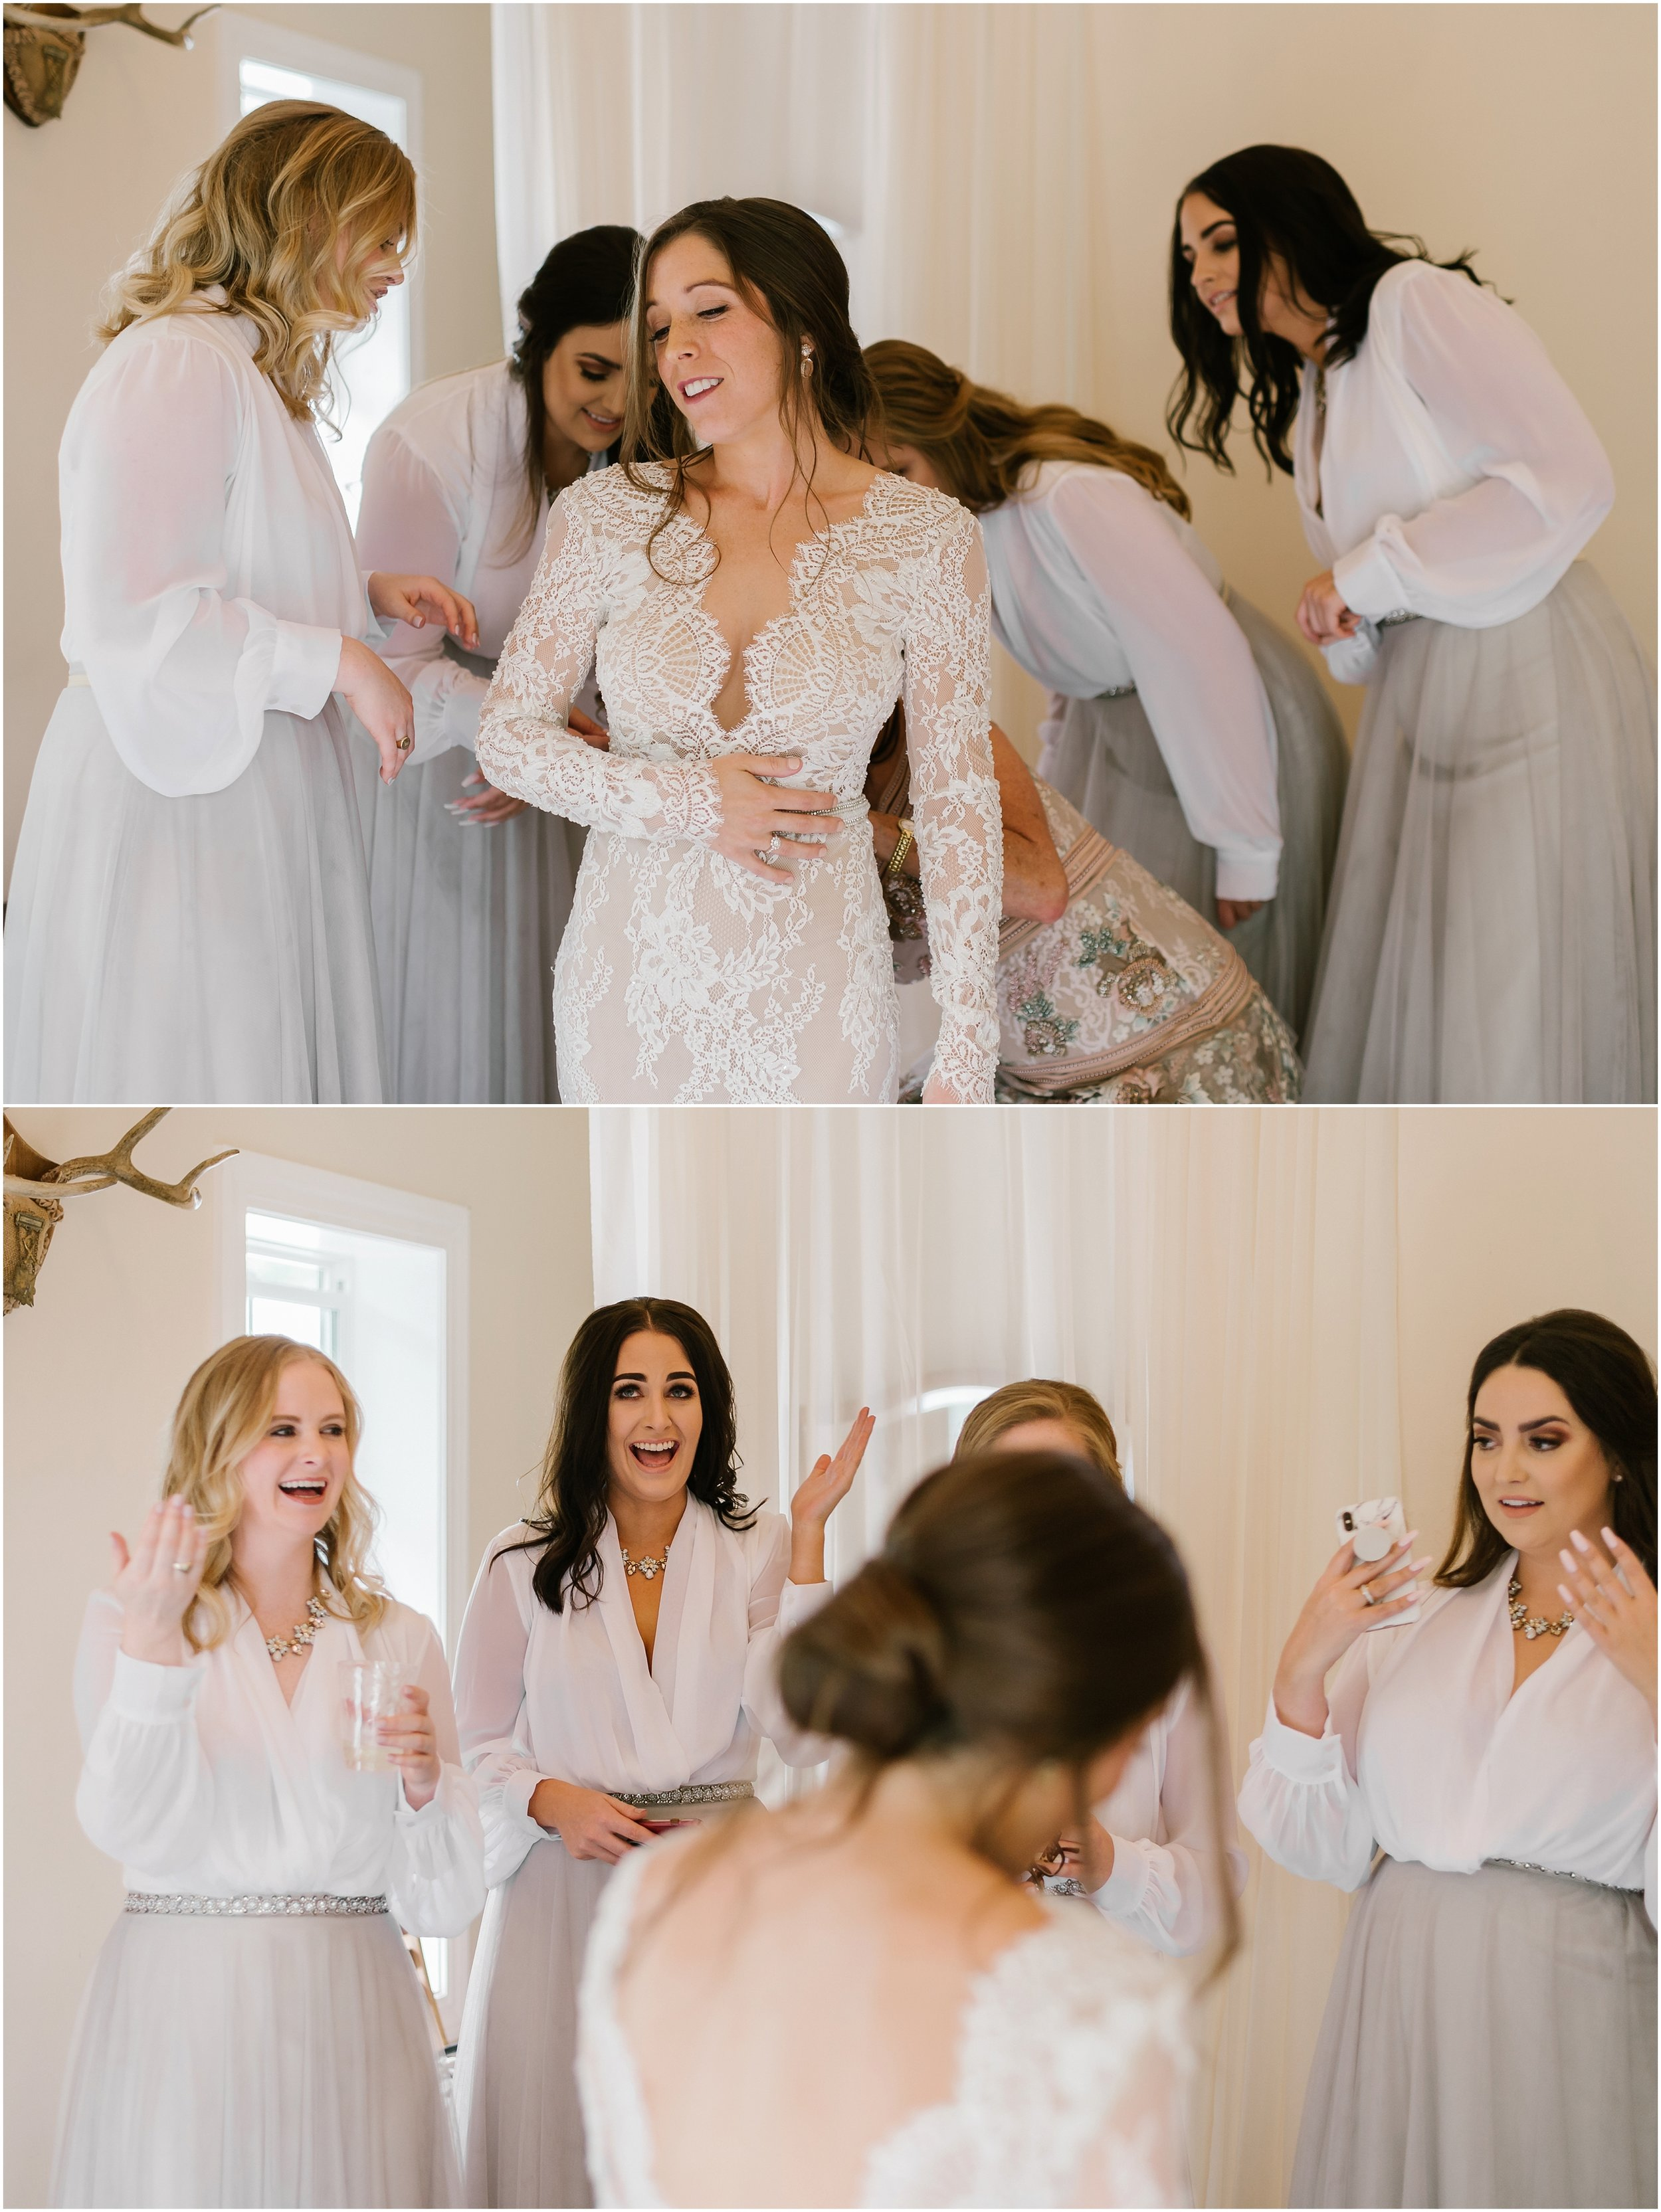 Rebecca_Shehorn_Photography_Indianapolis_Wedding_Photographer_9251.jpg